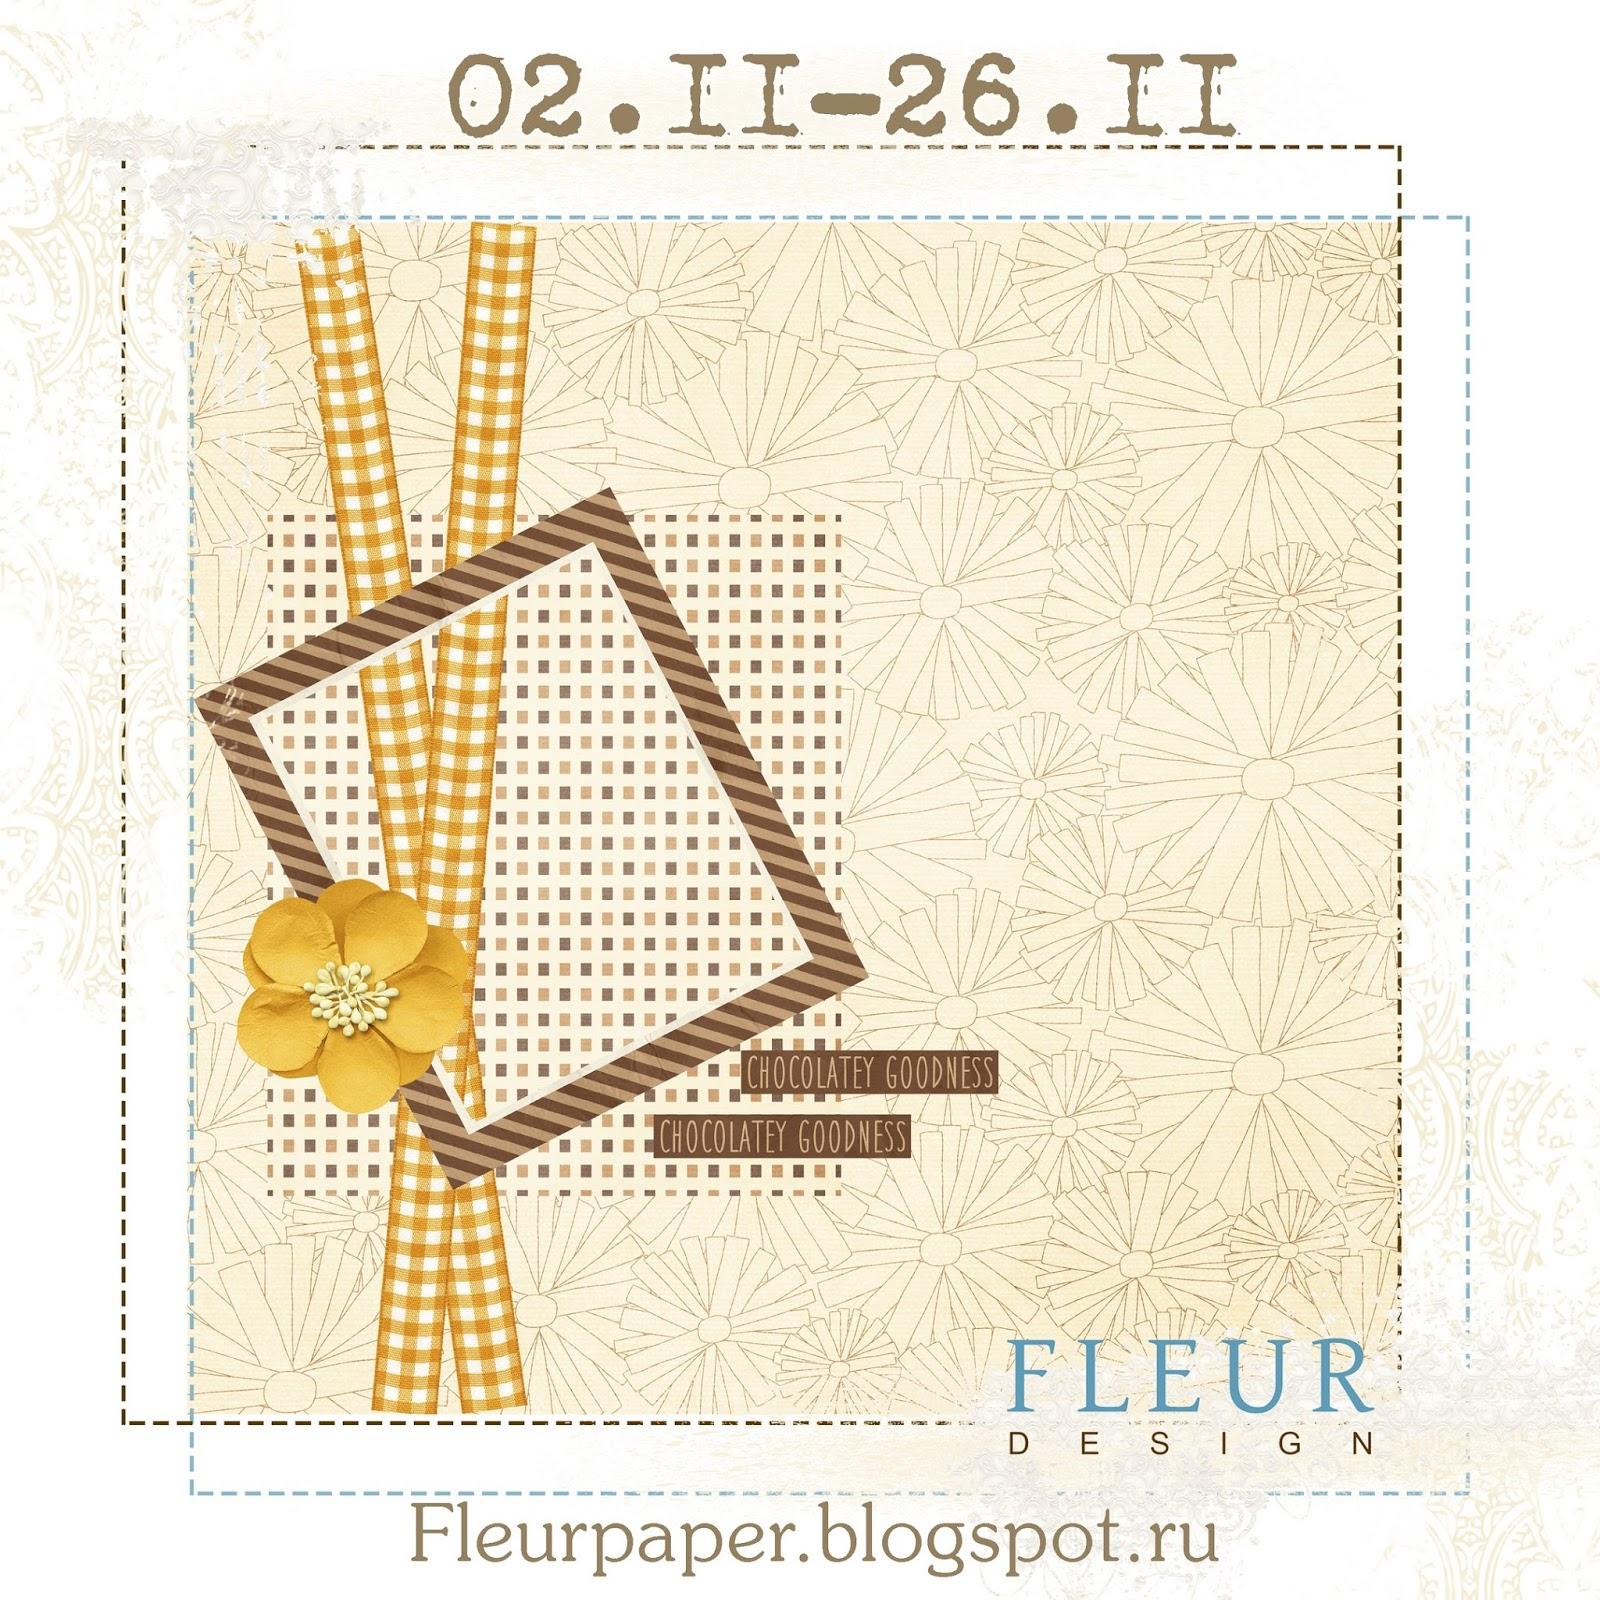 http://fleurpaper.blogspot.com/2015/11/13.html